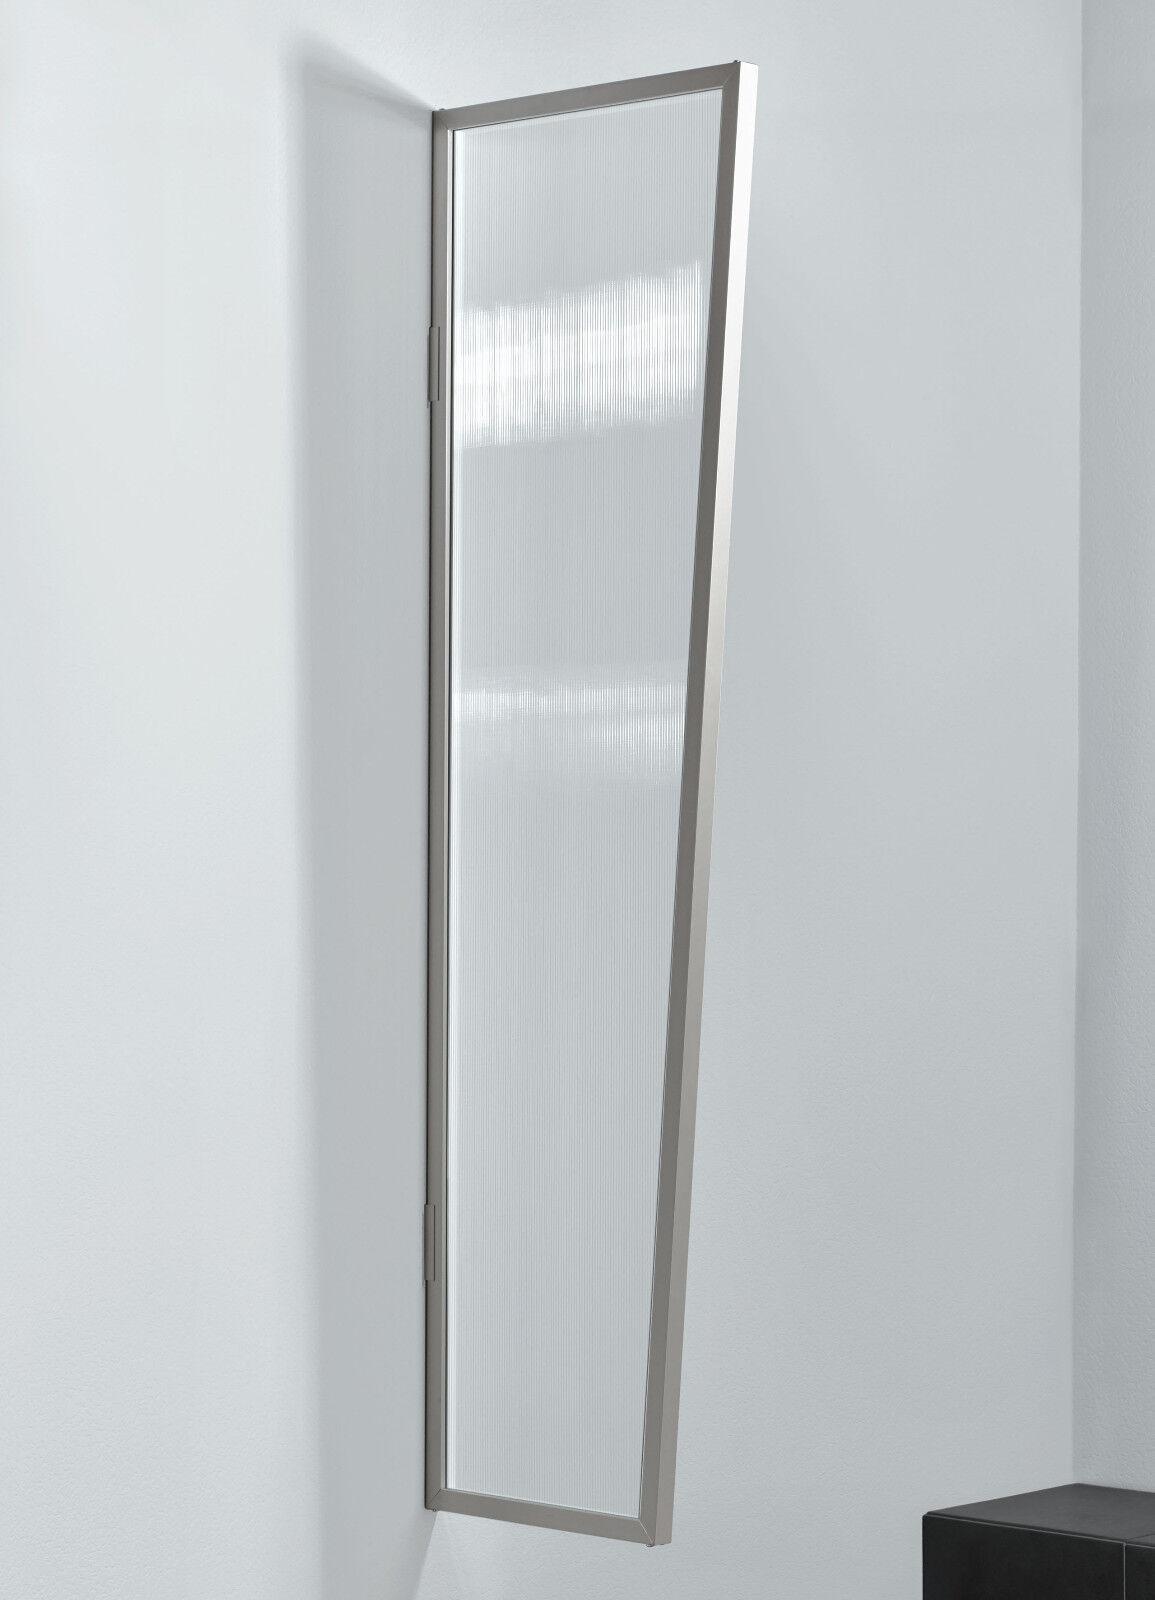 Gutta Seitenblende B1 B1 B1 Stegplatte klar 200x60x45 cm edelstahl optik 549e53